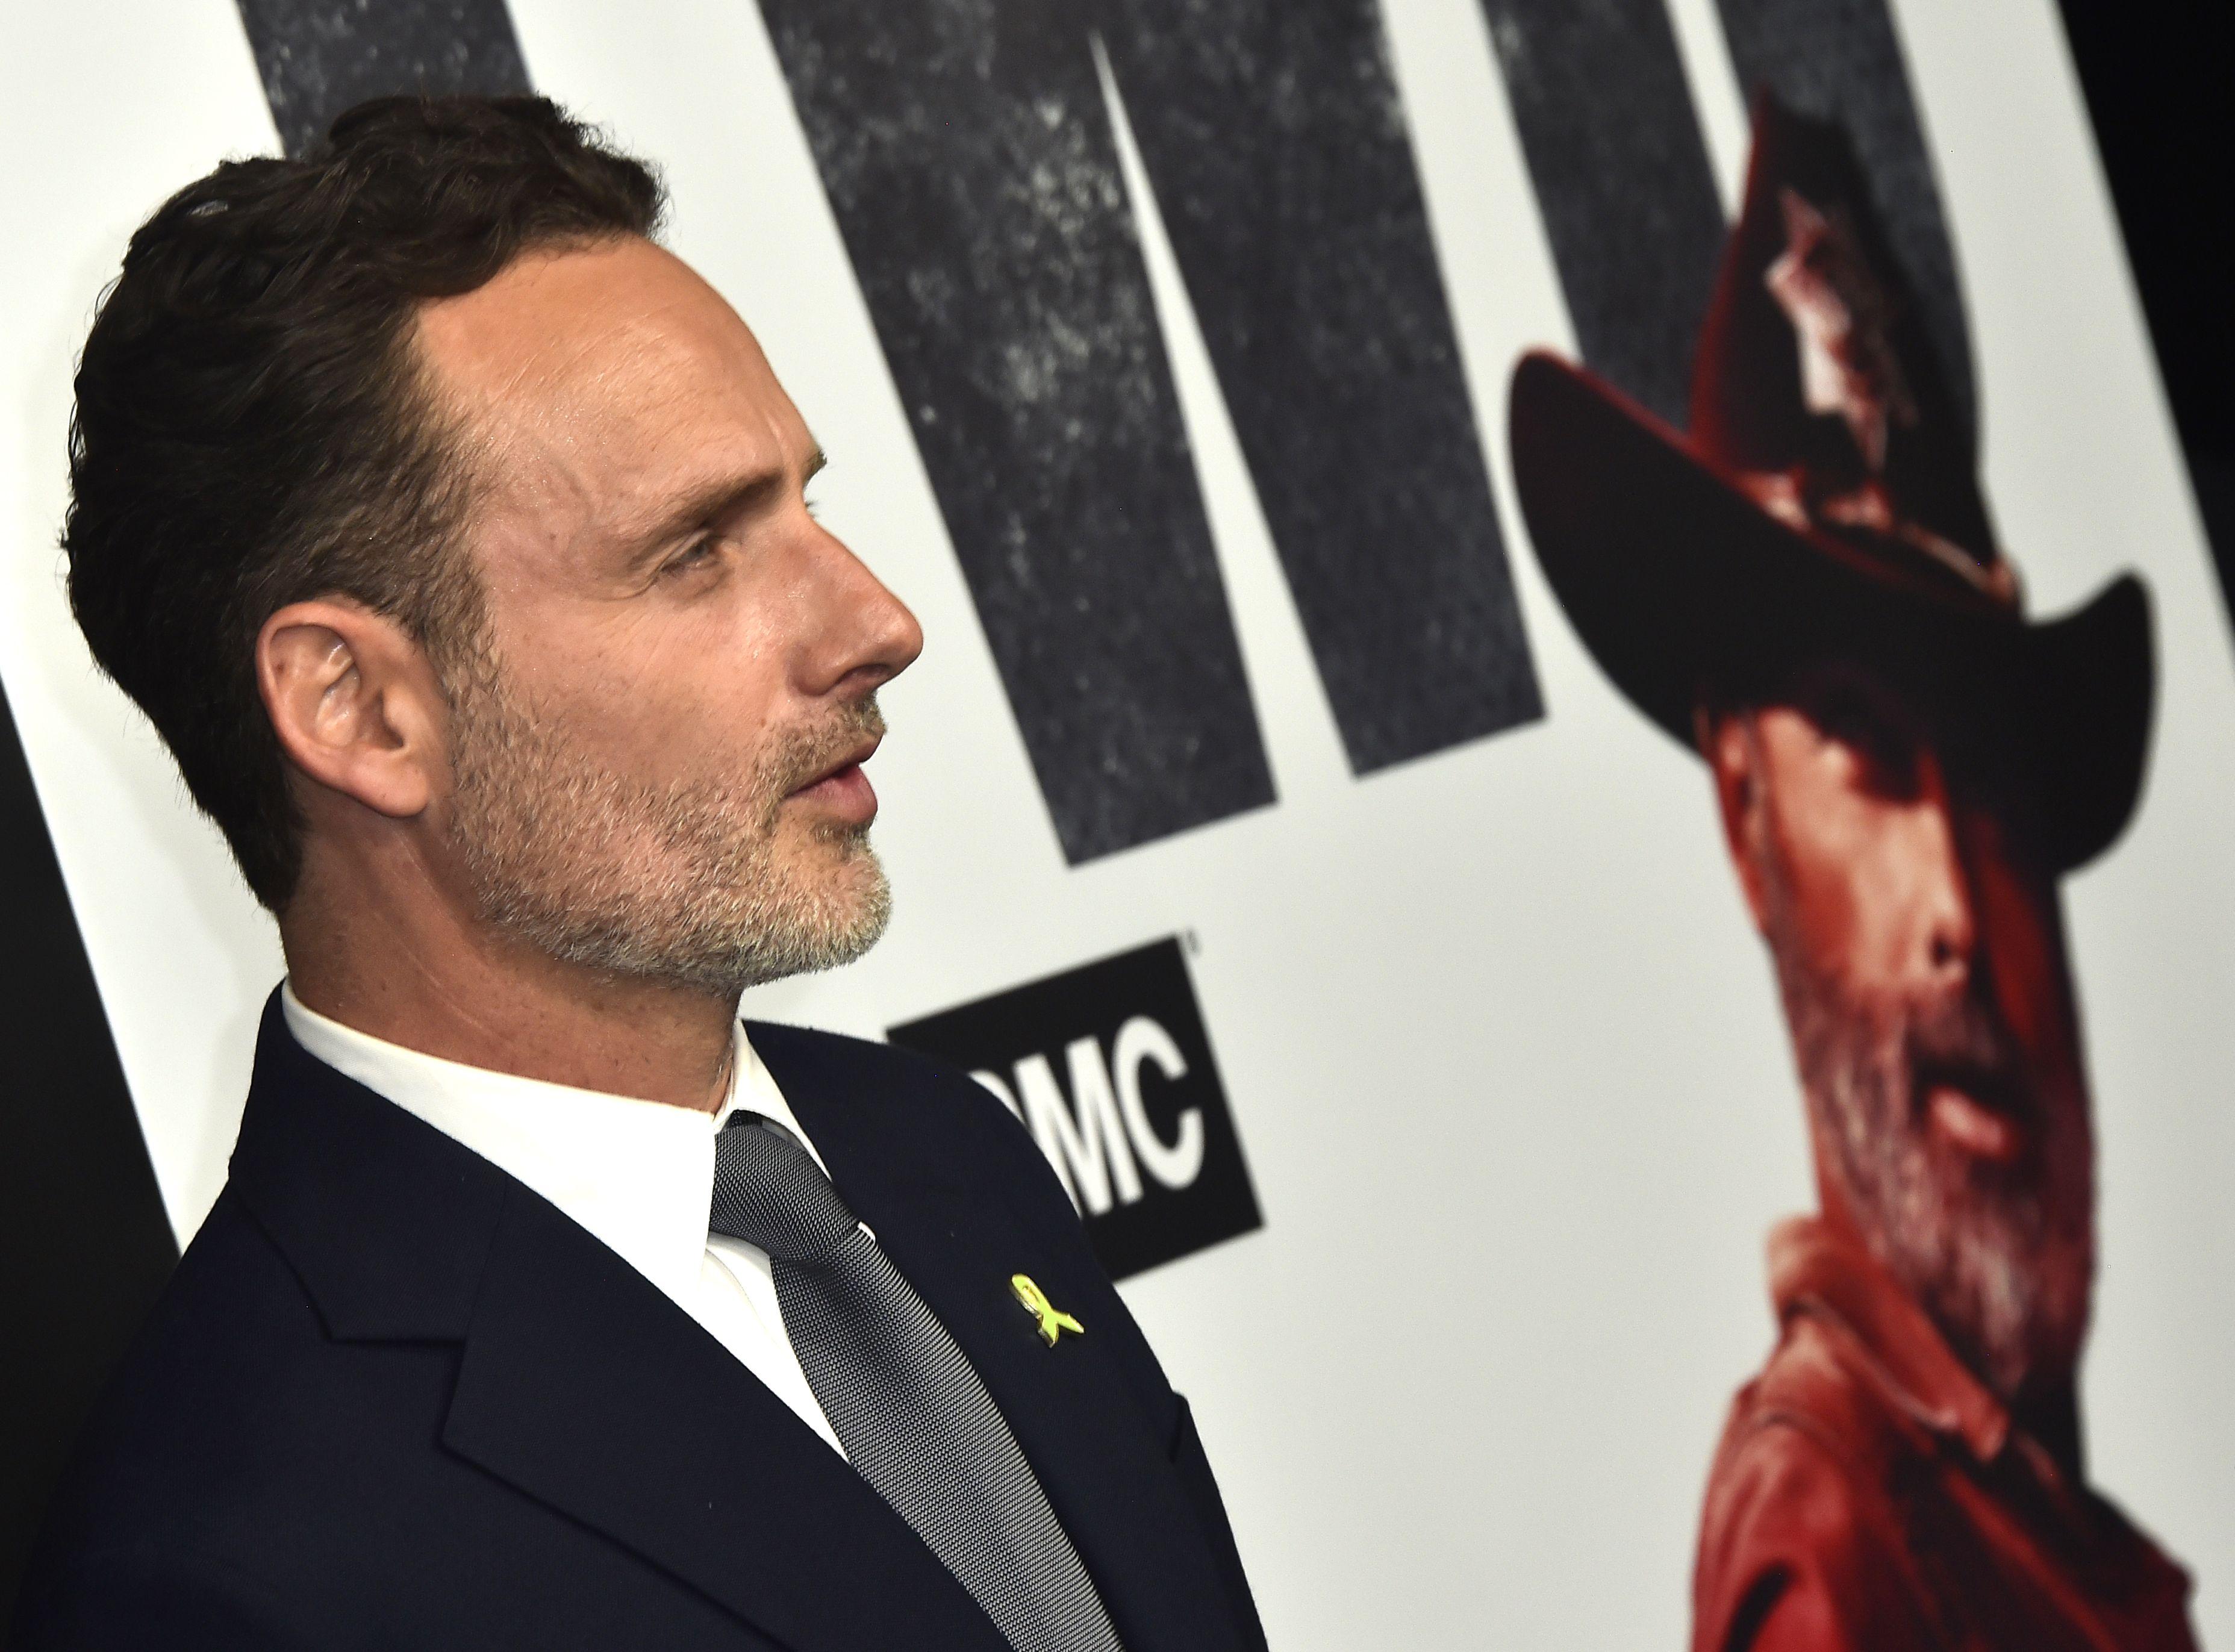 Andrew Lincoln no vuelve a The Walking Dead - No Dirigirá Episodios